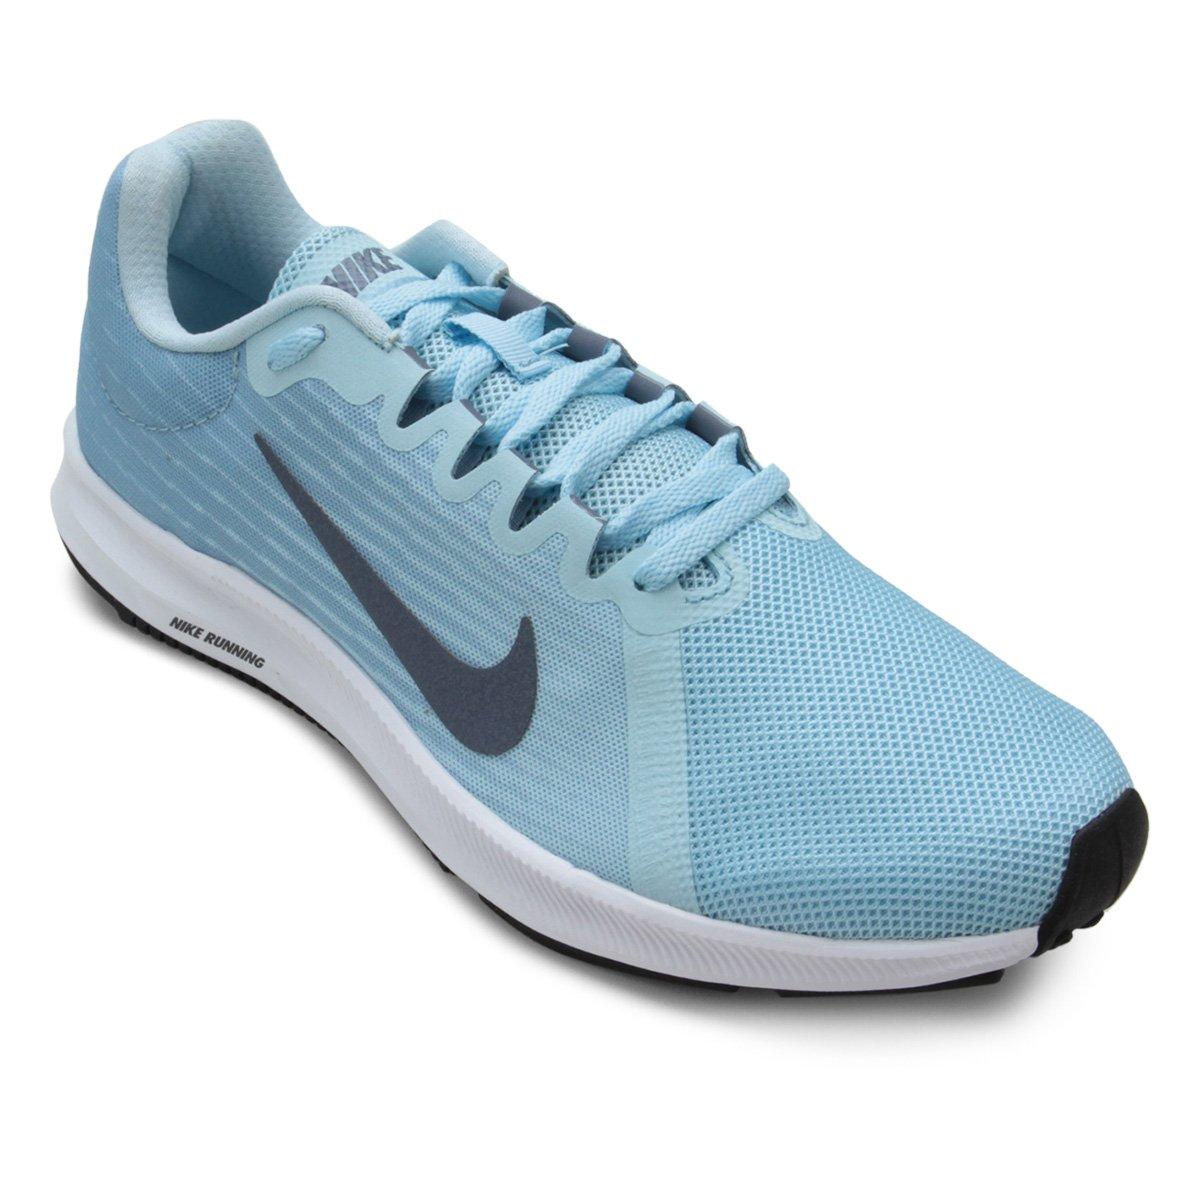 Tênis Nike Wmns Downshifter 8 Feminino Azul Claro